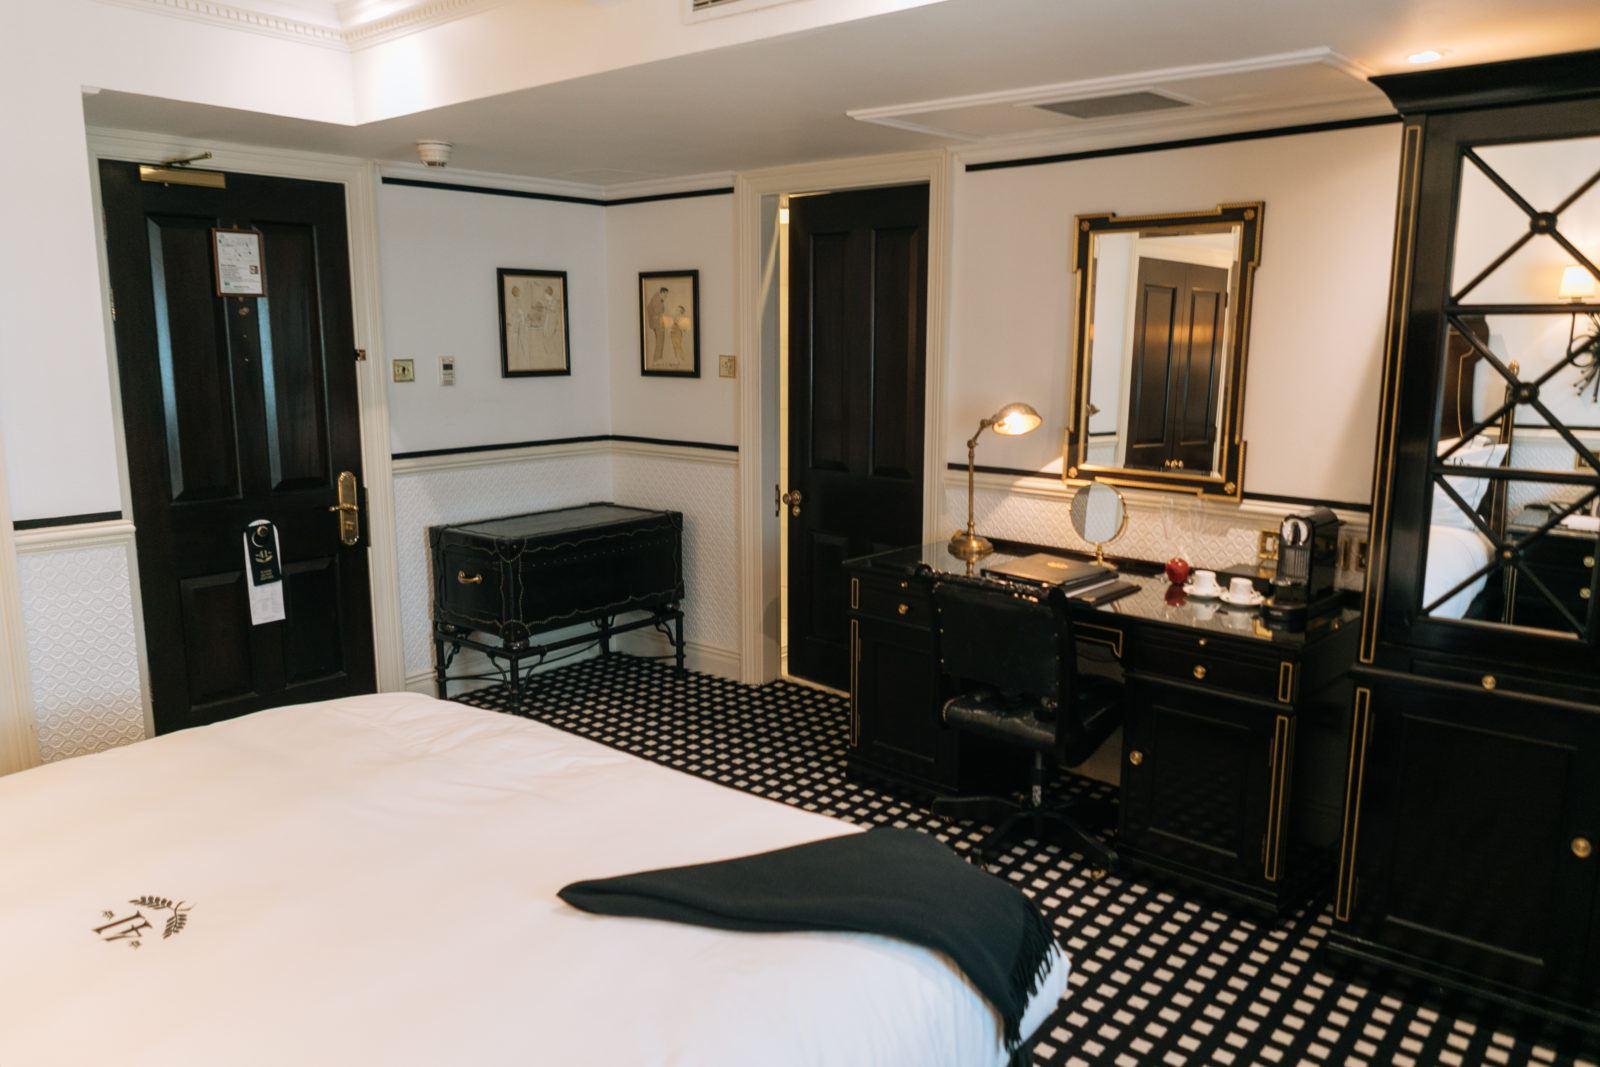 Expedia VIP Access Hotel 41 Kach and Jonathan7